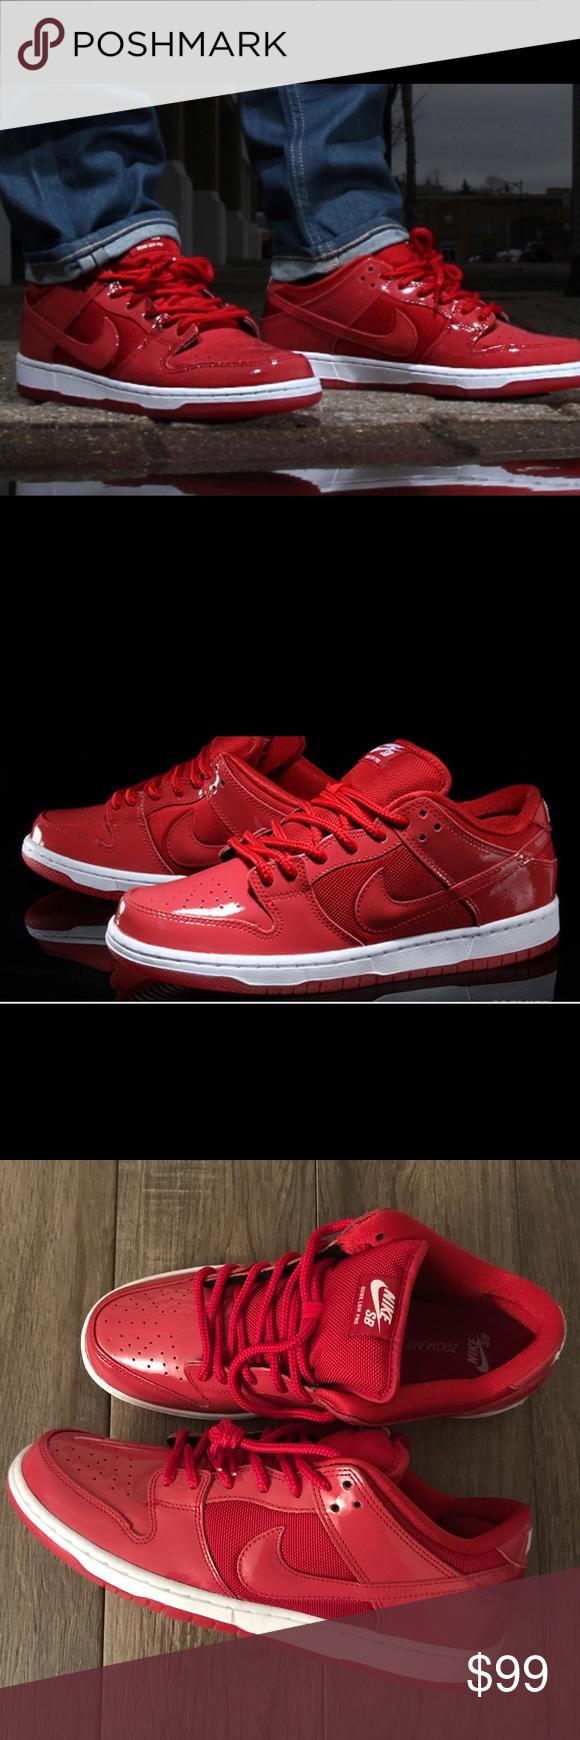 the best attitude aa34b 62c8e ... australia nike dunk low pro red patent leather retro jordan brand new  without box men s